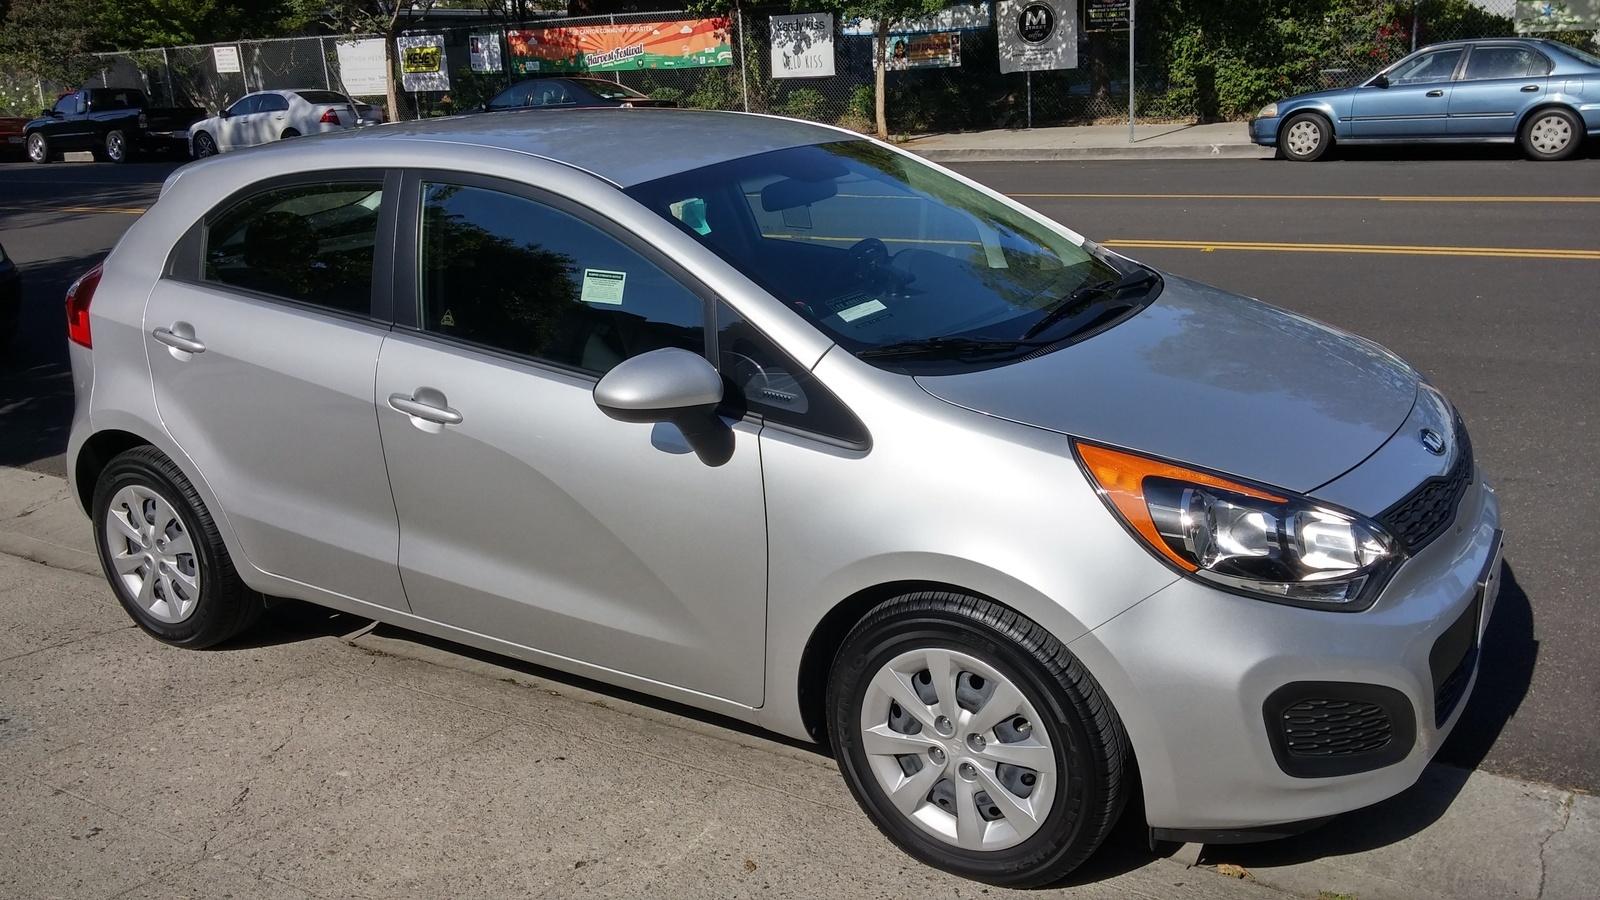 Car Dealerships In Fresno Ca >> Used Car Dealers In Bakersfield Ca | Upcomingcarshq.com